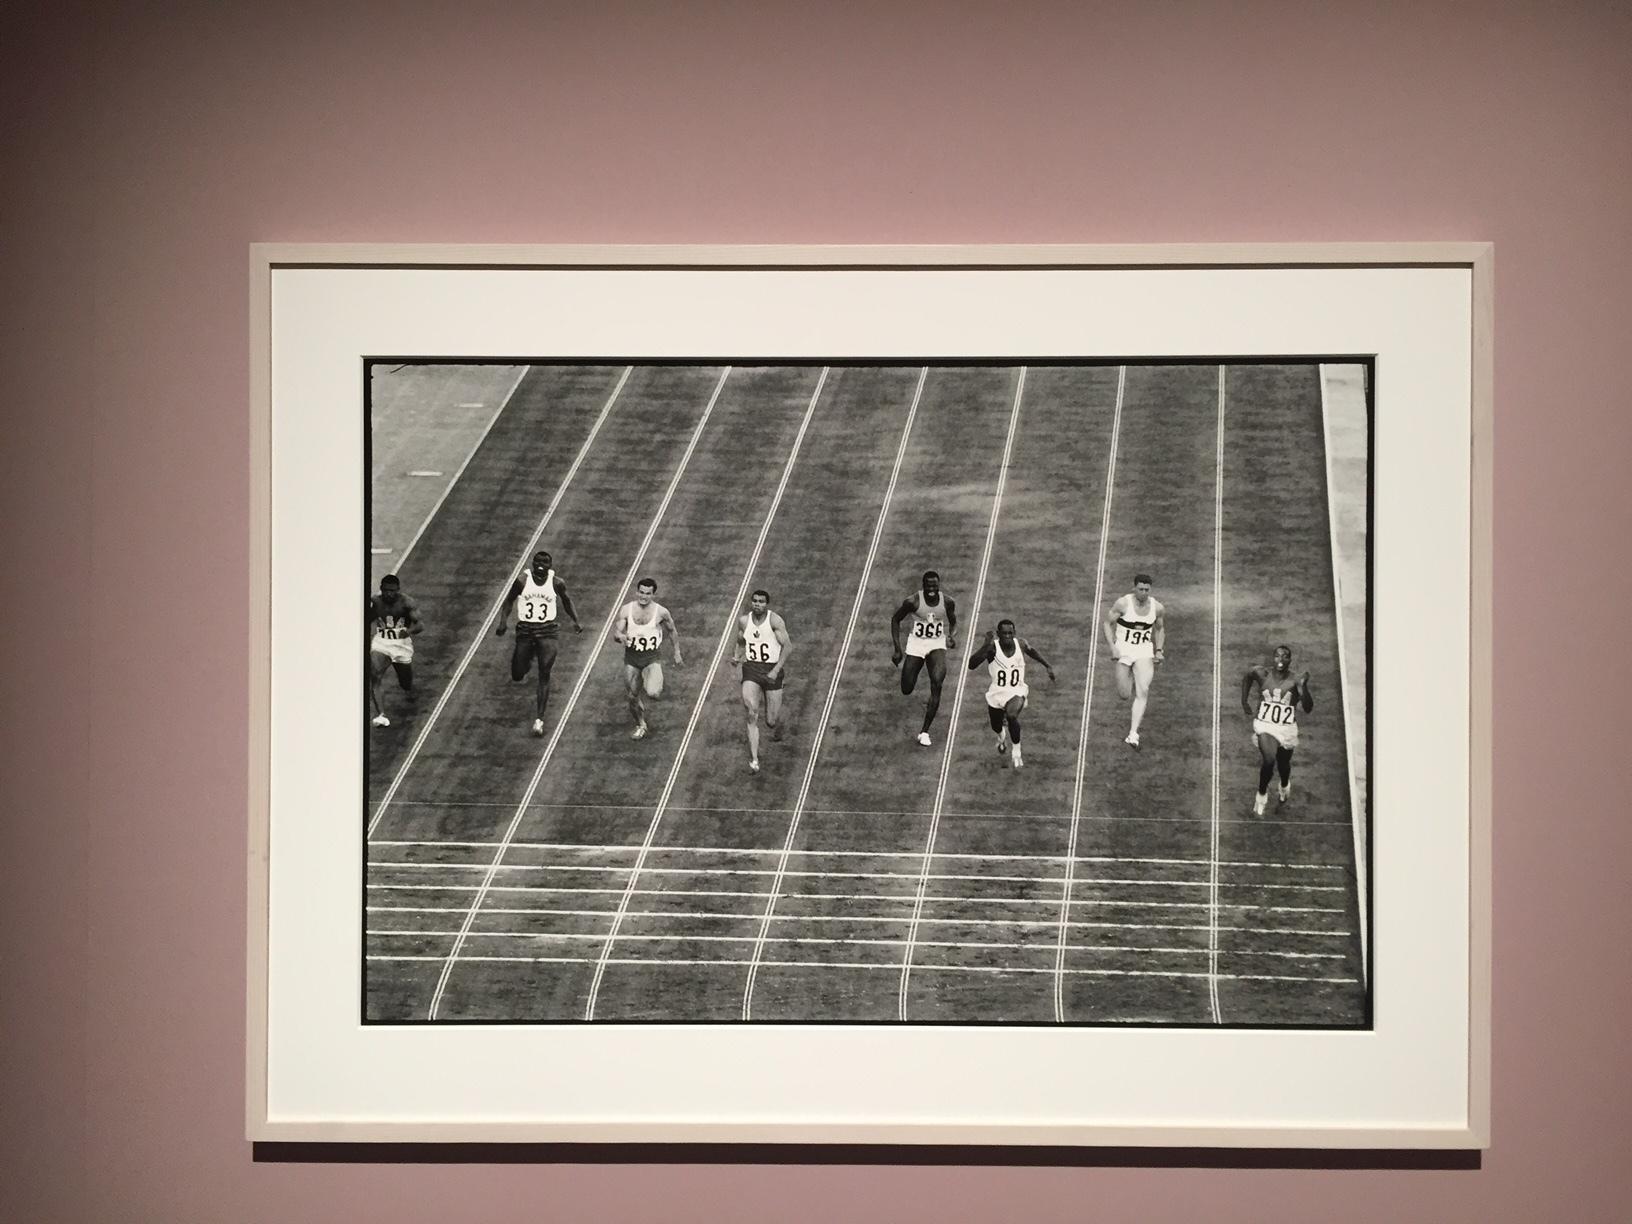 """DEPARDON/TOKYO 1964-2016""摄影展中展示的现场照片 ©️ 小池タカエ"